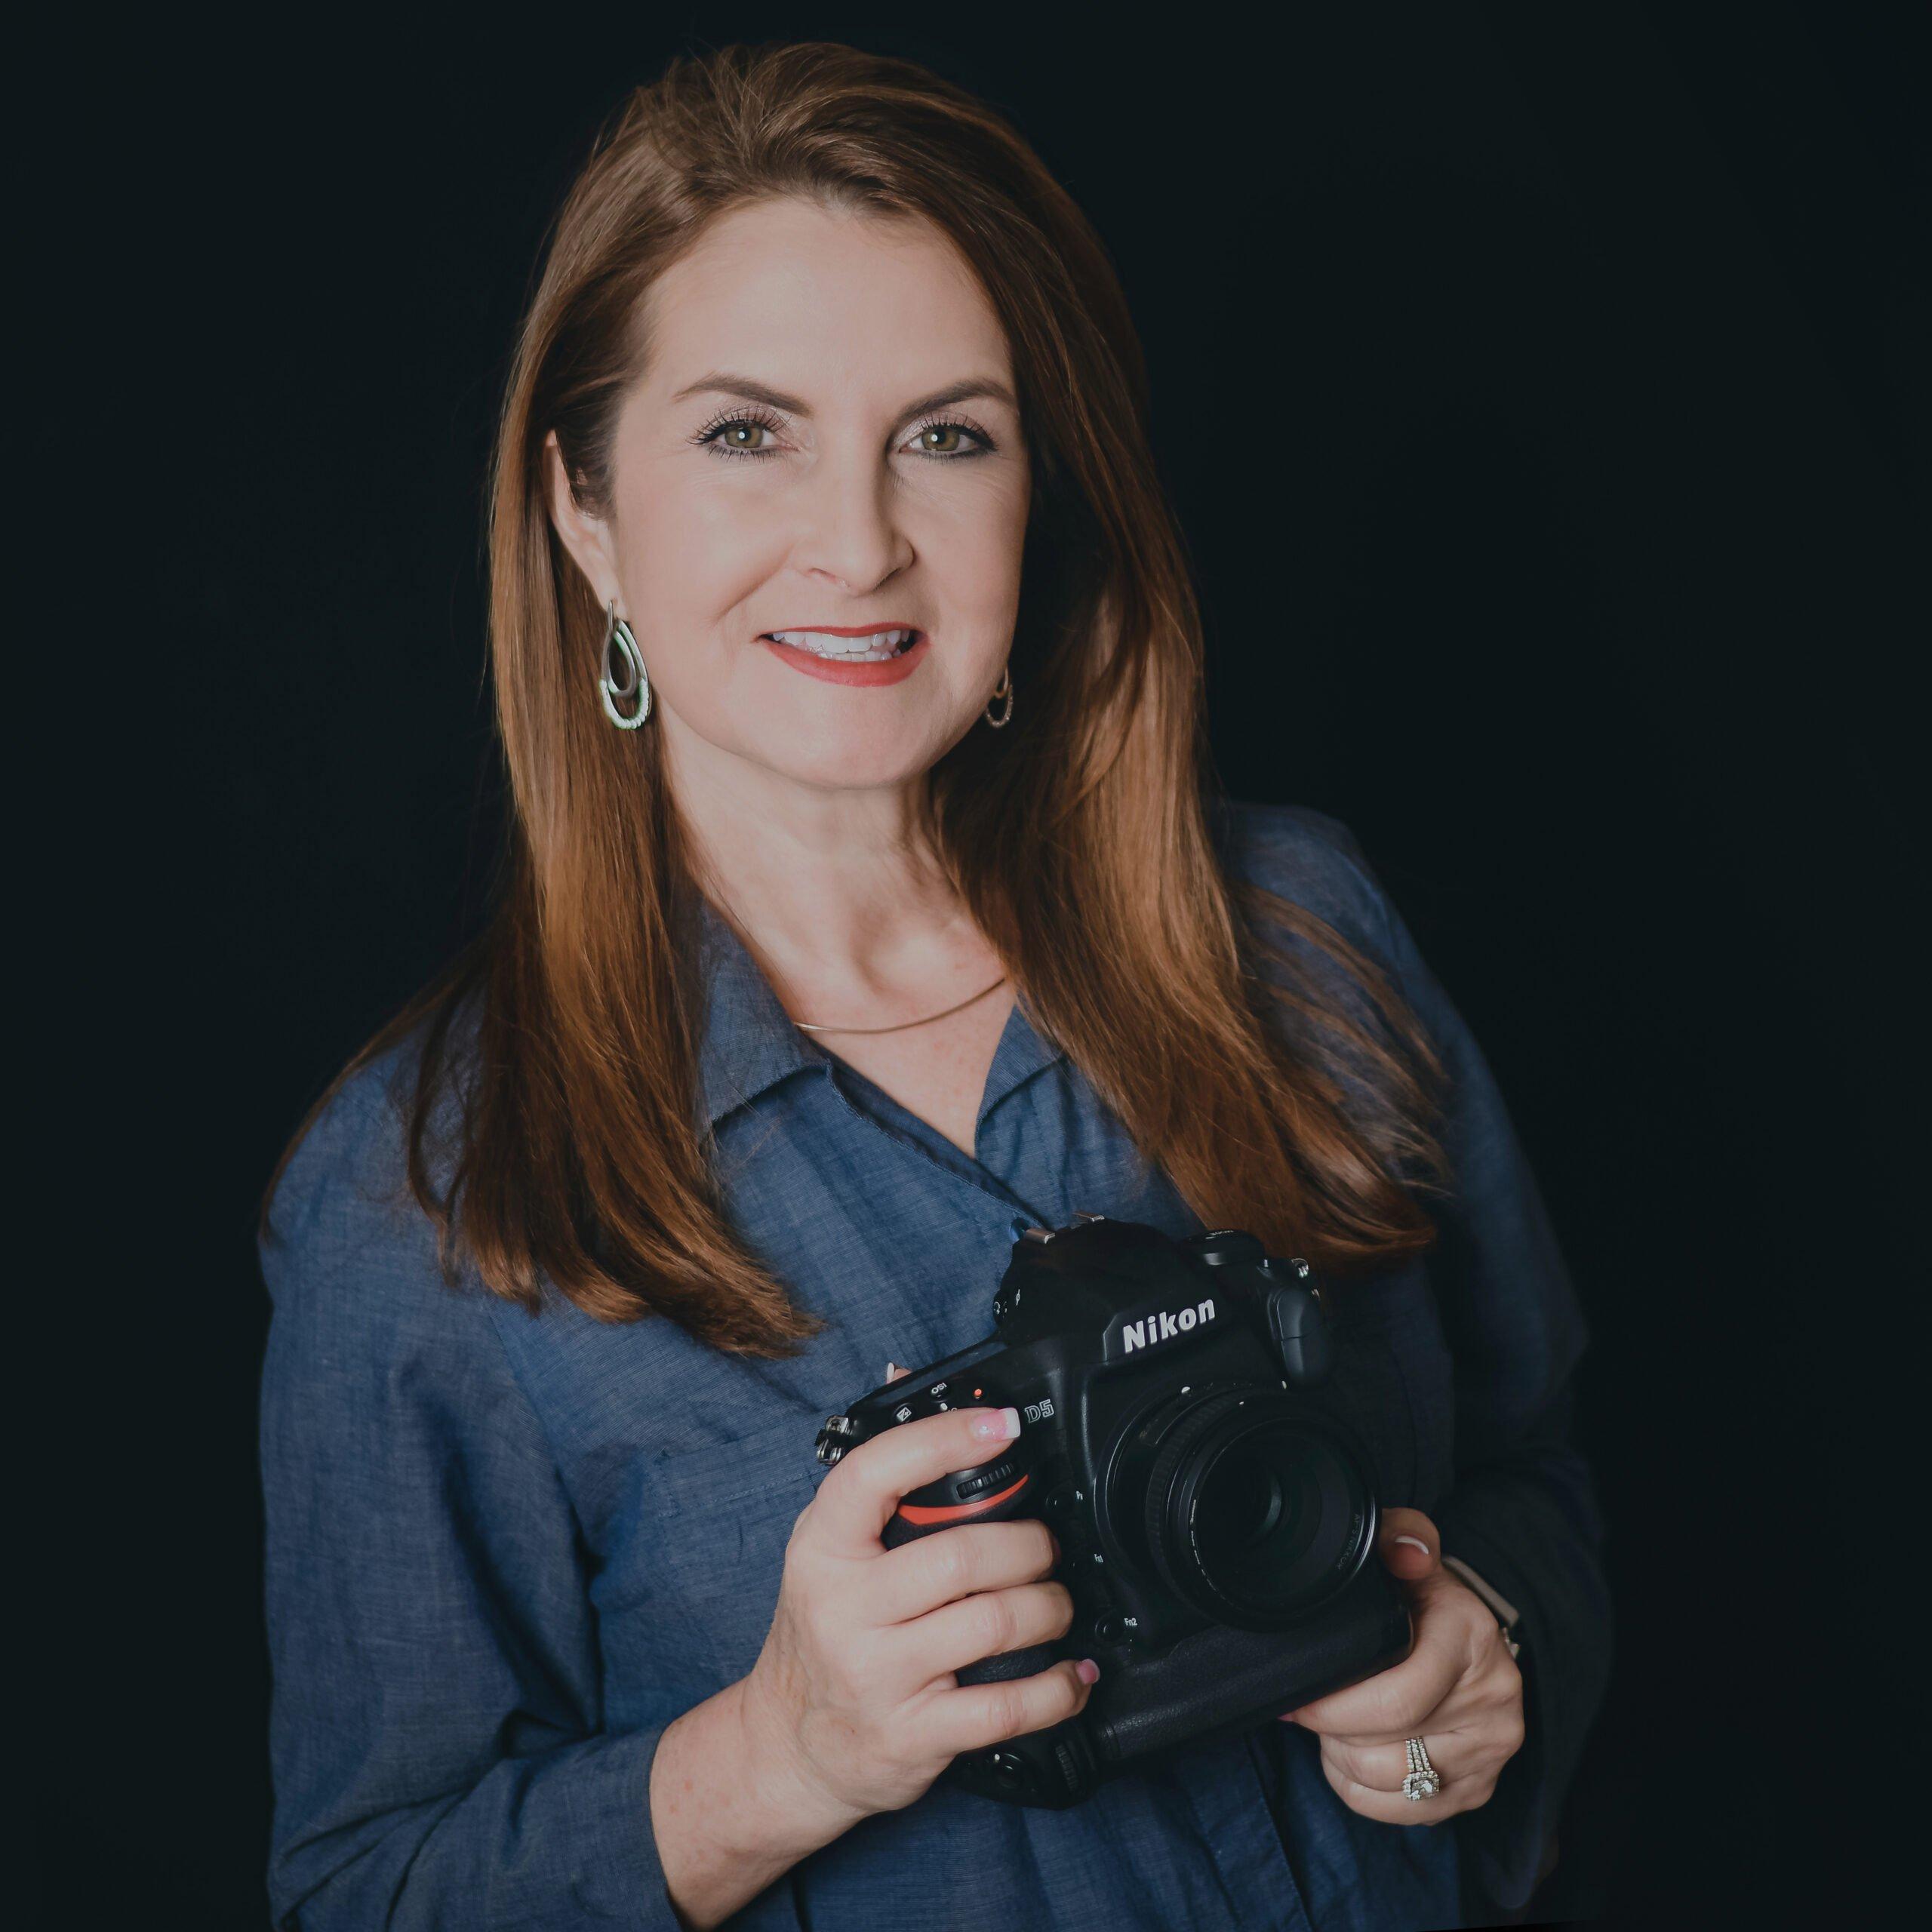 Lisa Rowland from Lisa Rowland Photography in Trenton, Florida